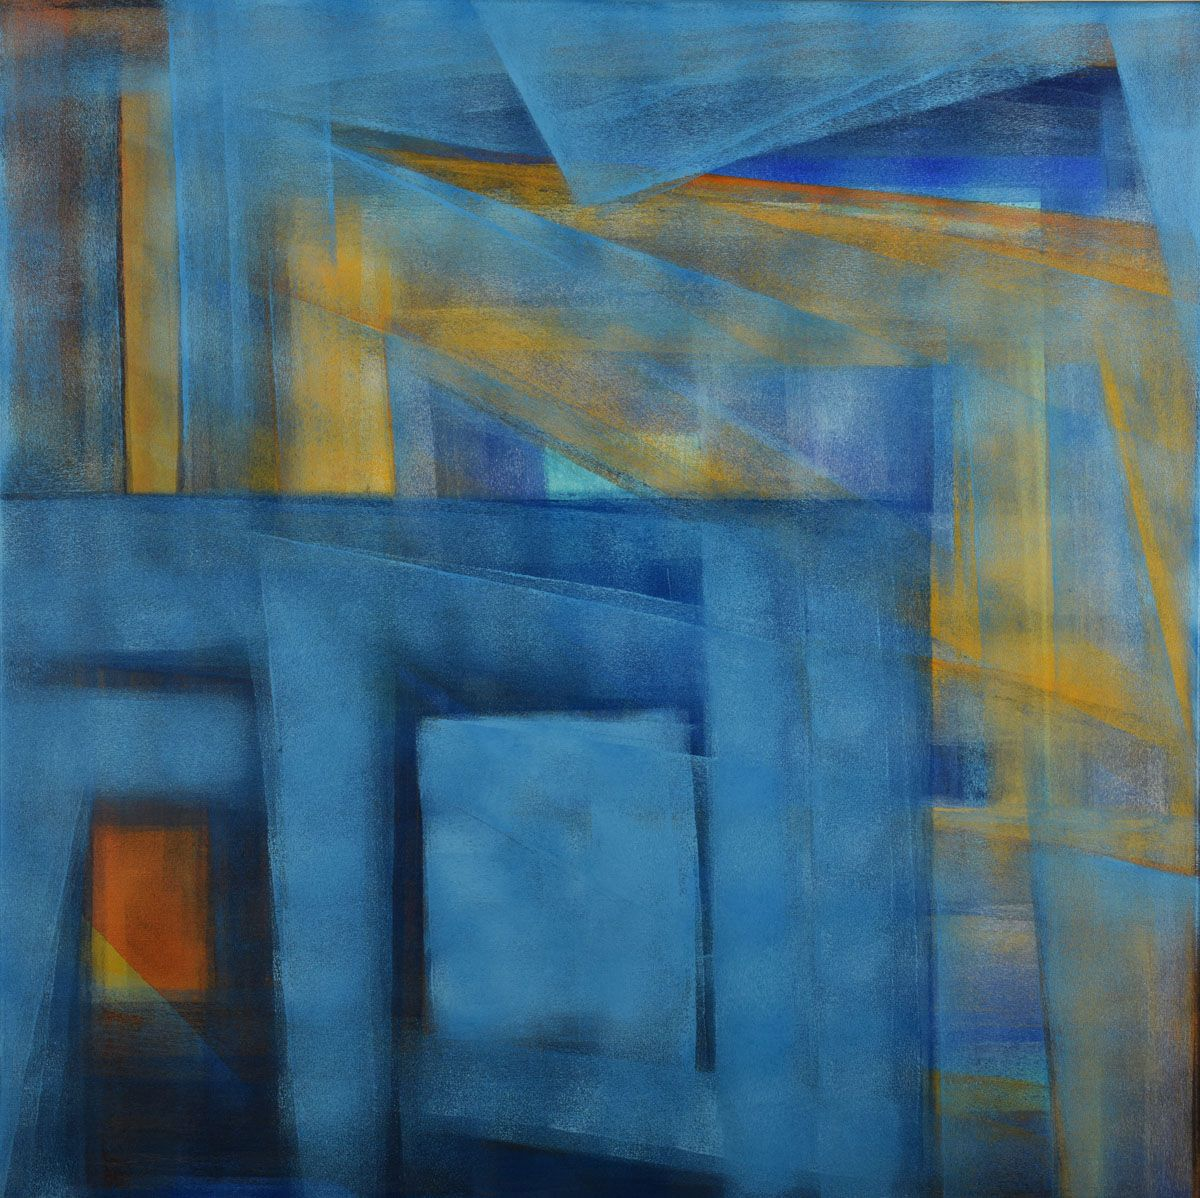 The_Window_1_painting_by_Vibha_Nanda-compressor